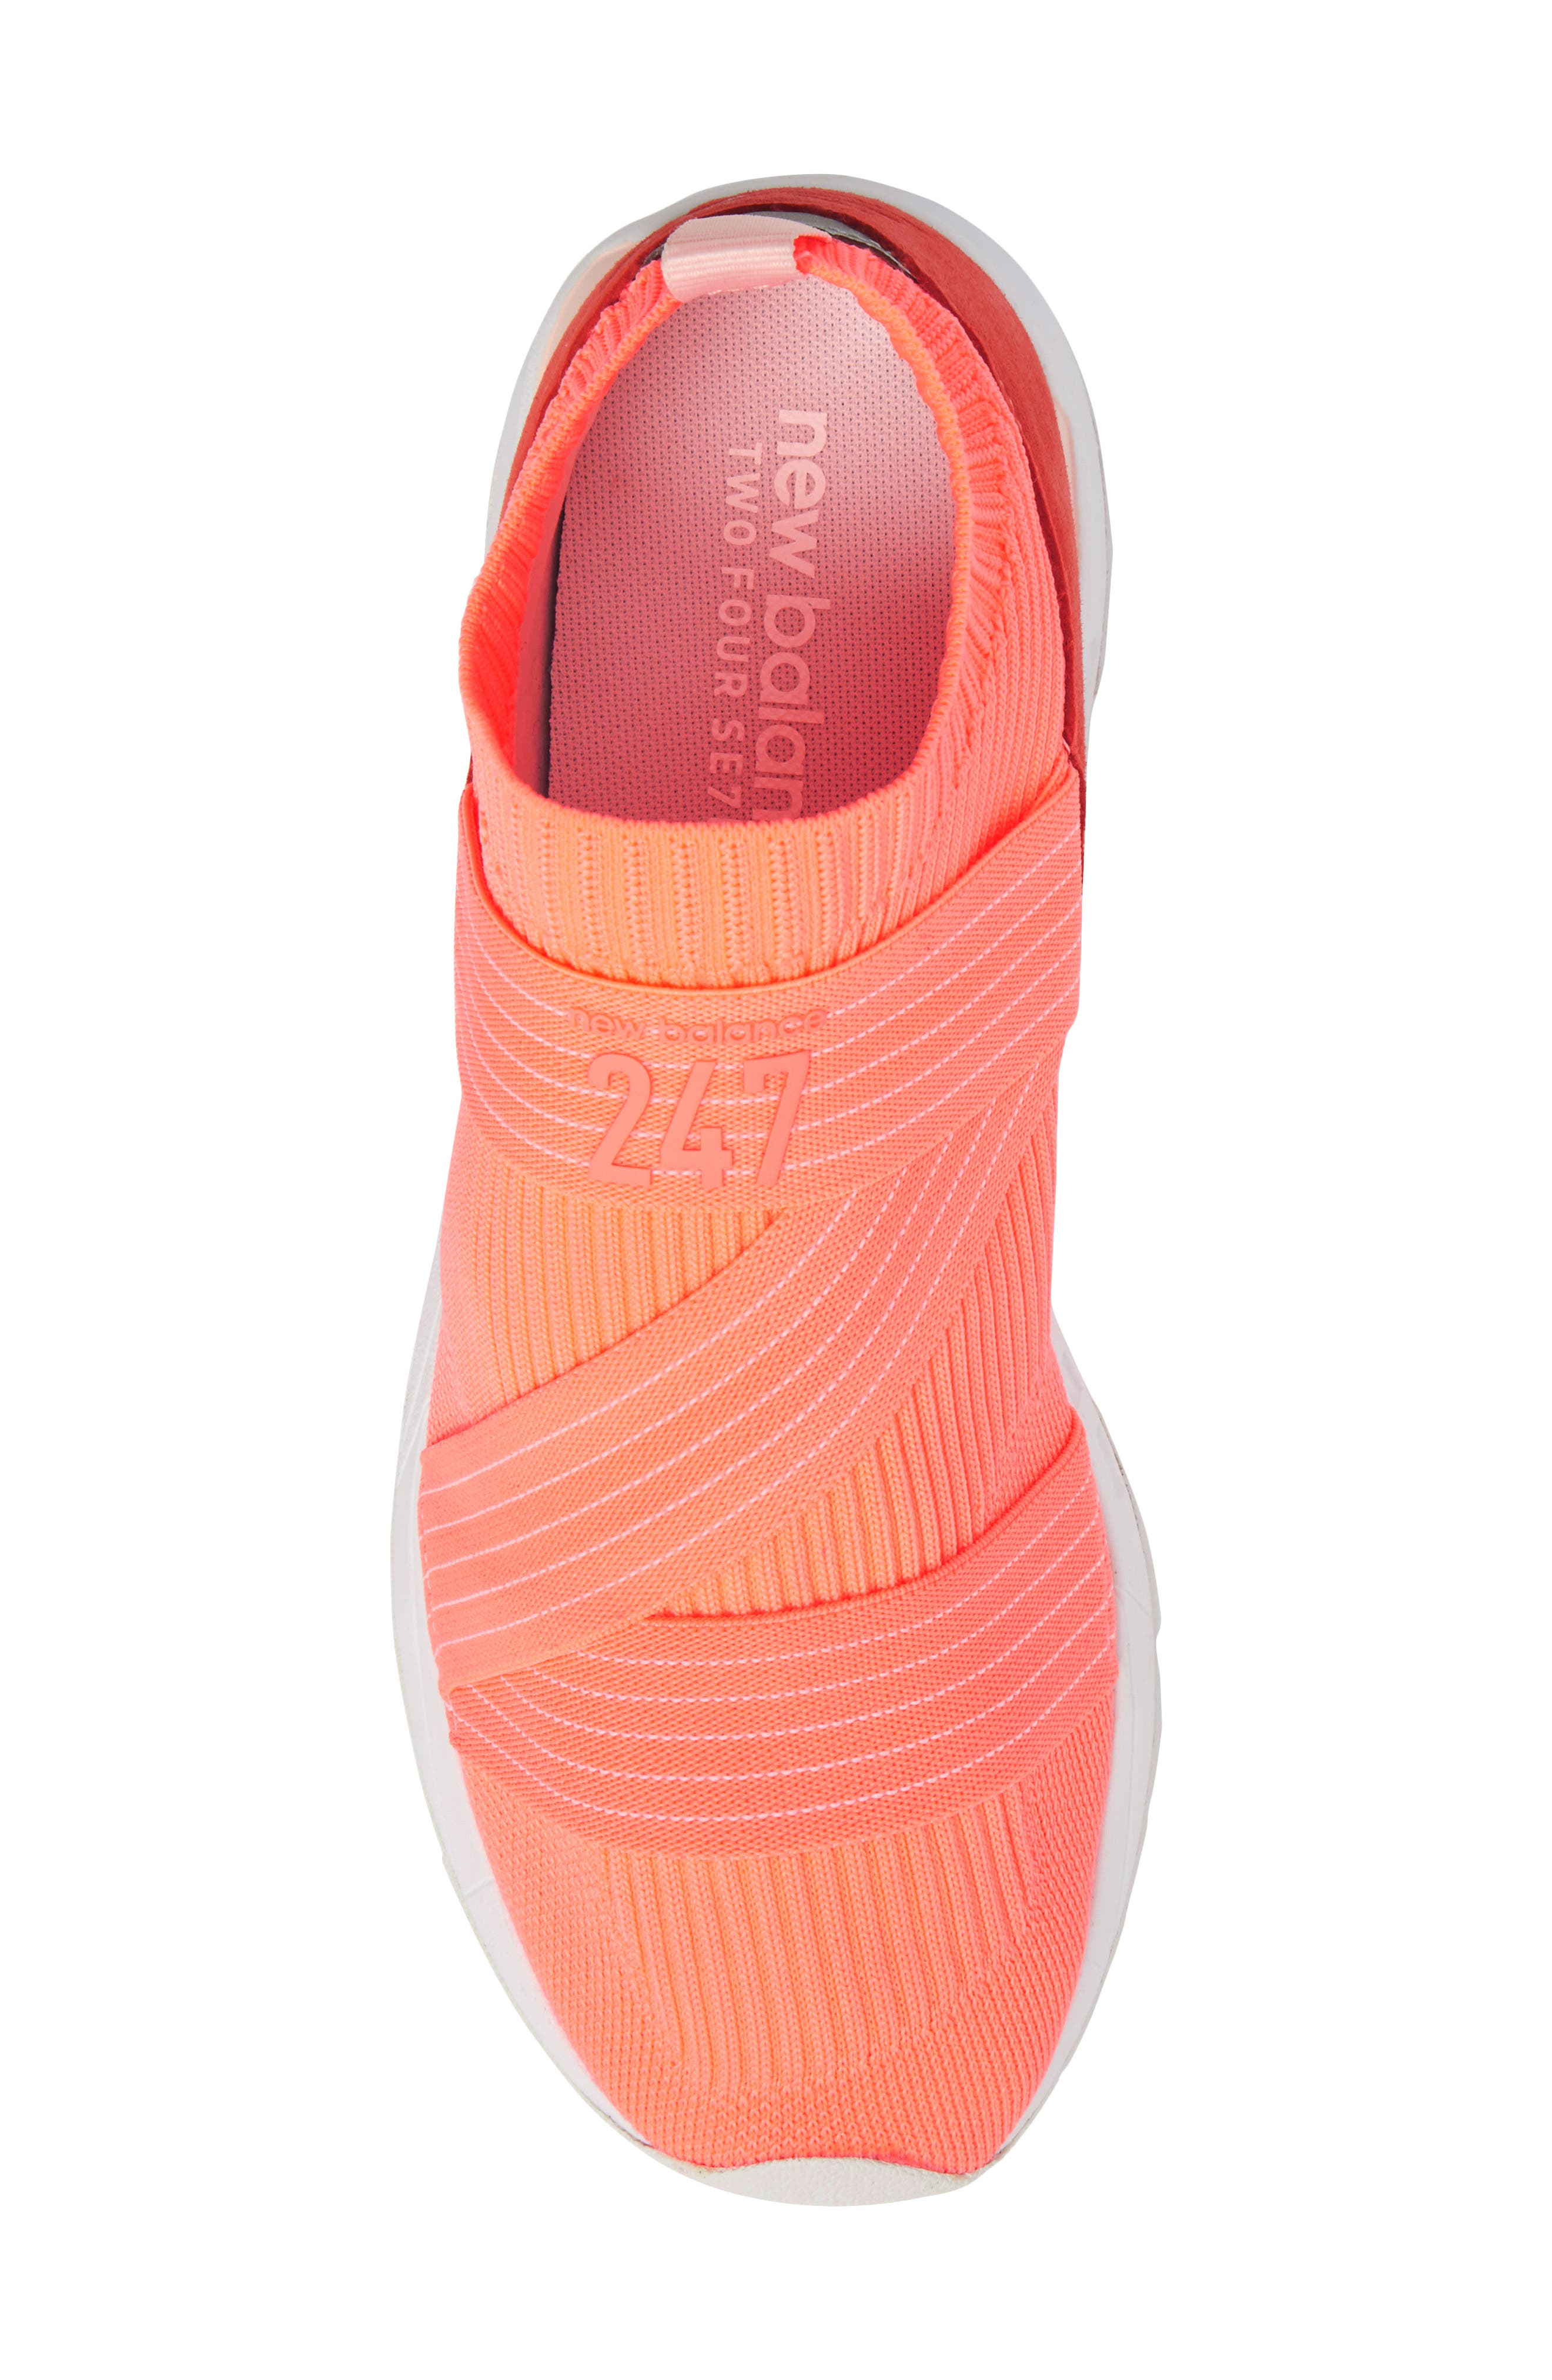 247 Knit Sneaker,                             Alternate thumbnail 10, color,